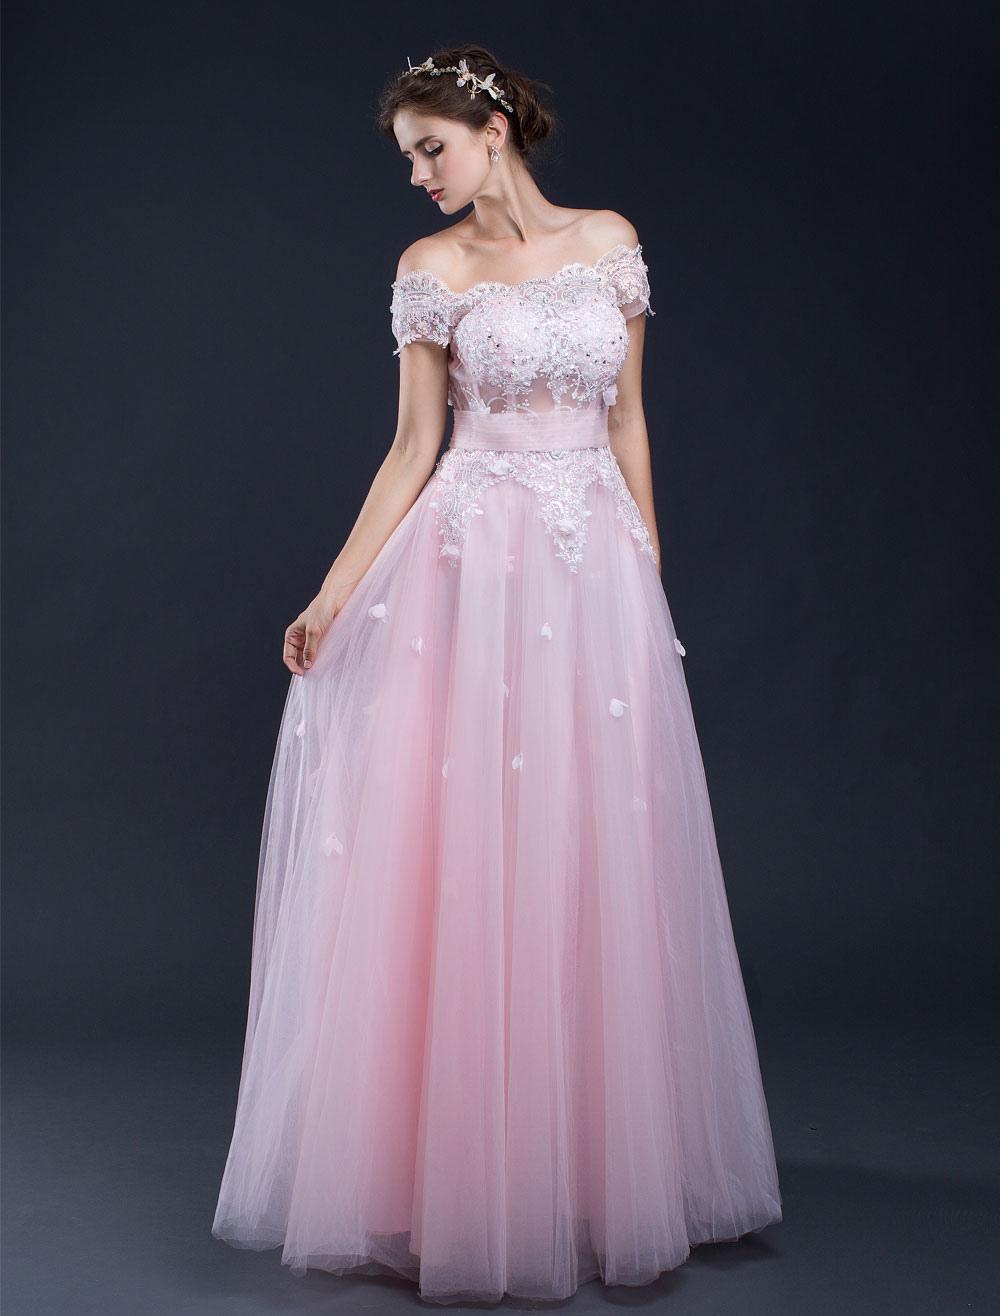 Beach Wedding Dress Pink Lace Applique Off-the-shoulder A-line Floor-length Bridal Gown (Pink Wedding Dress) photo